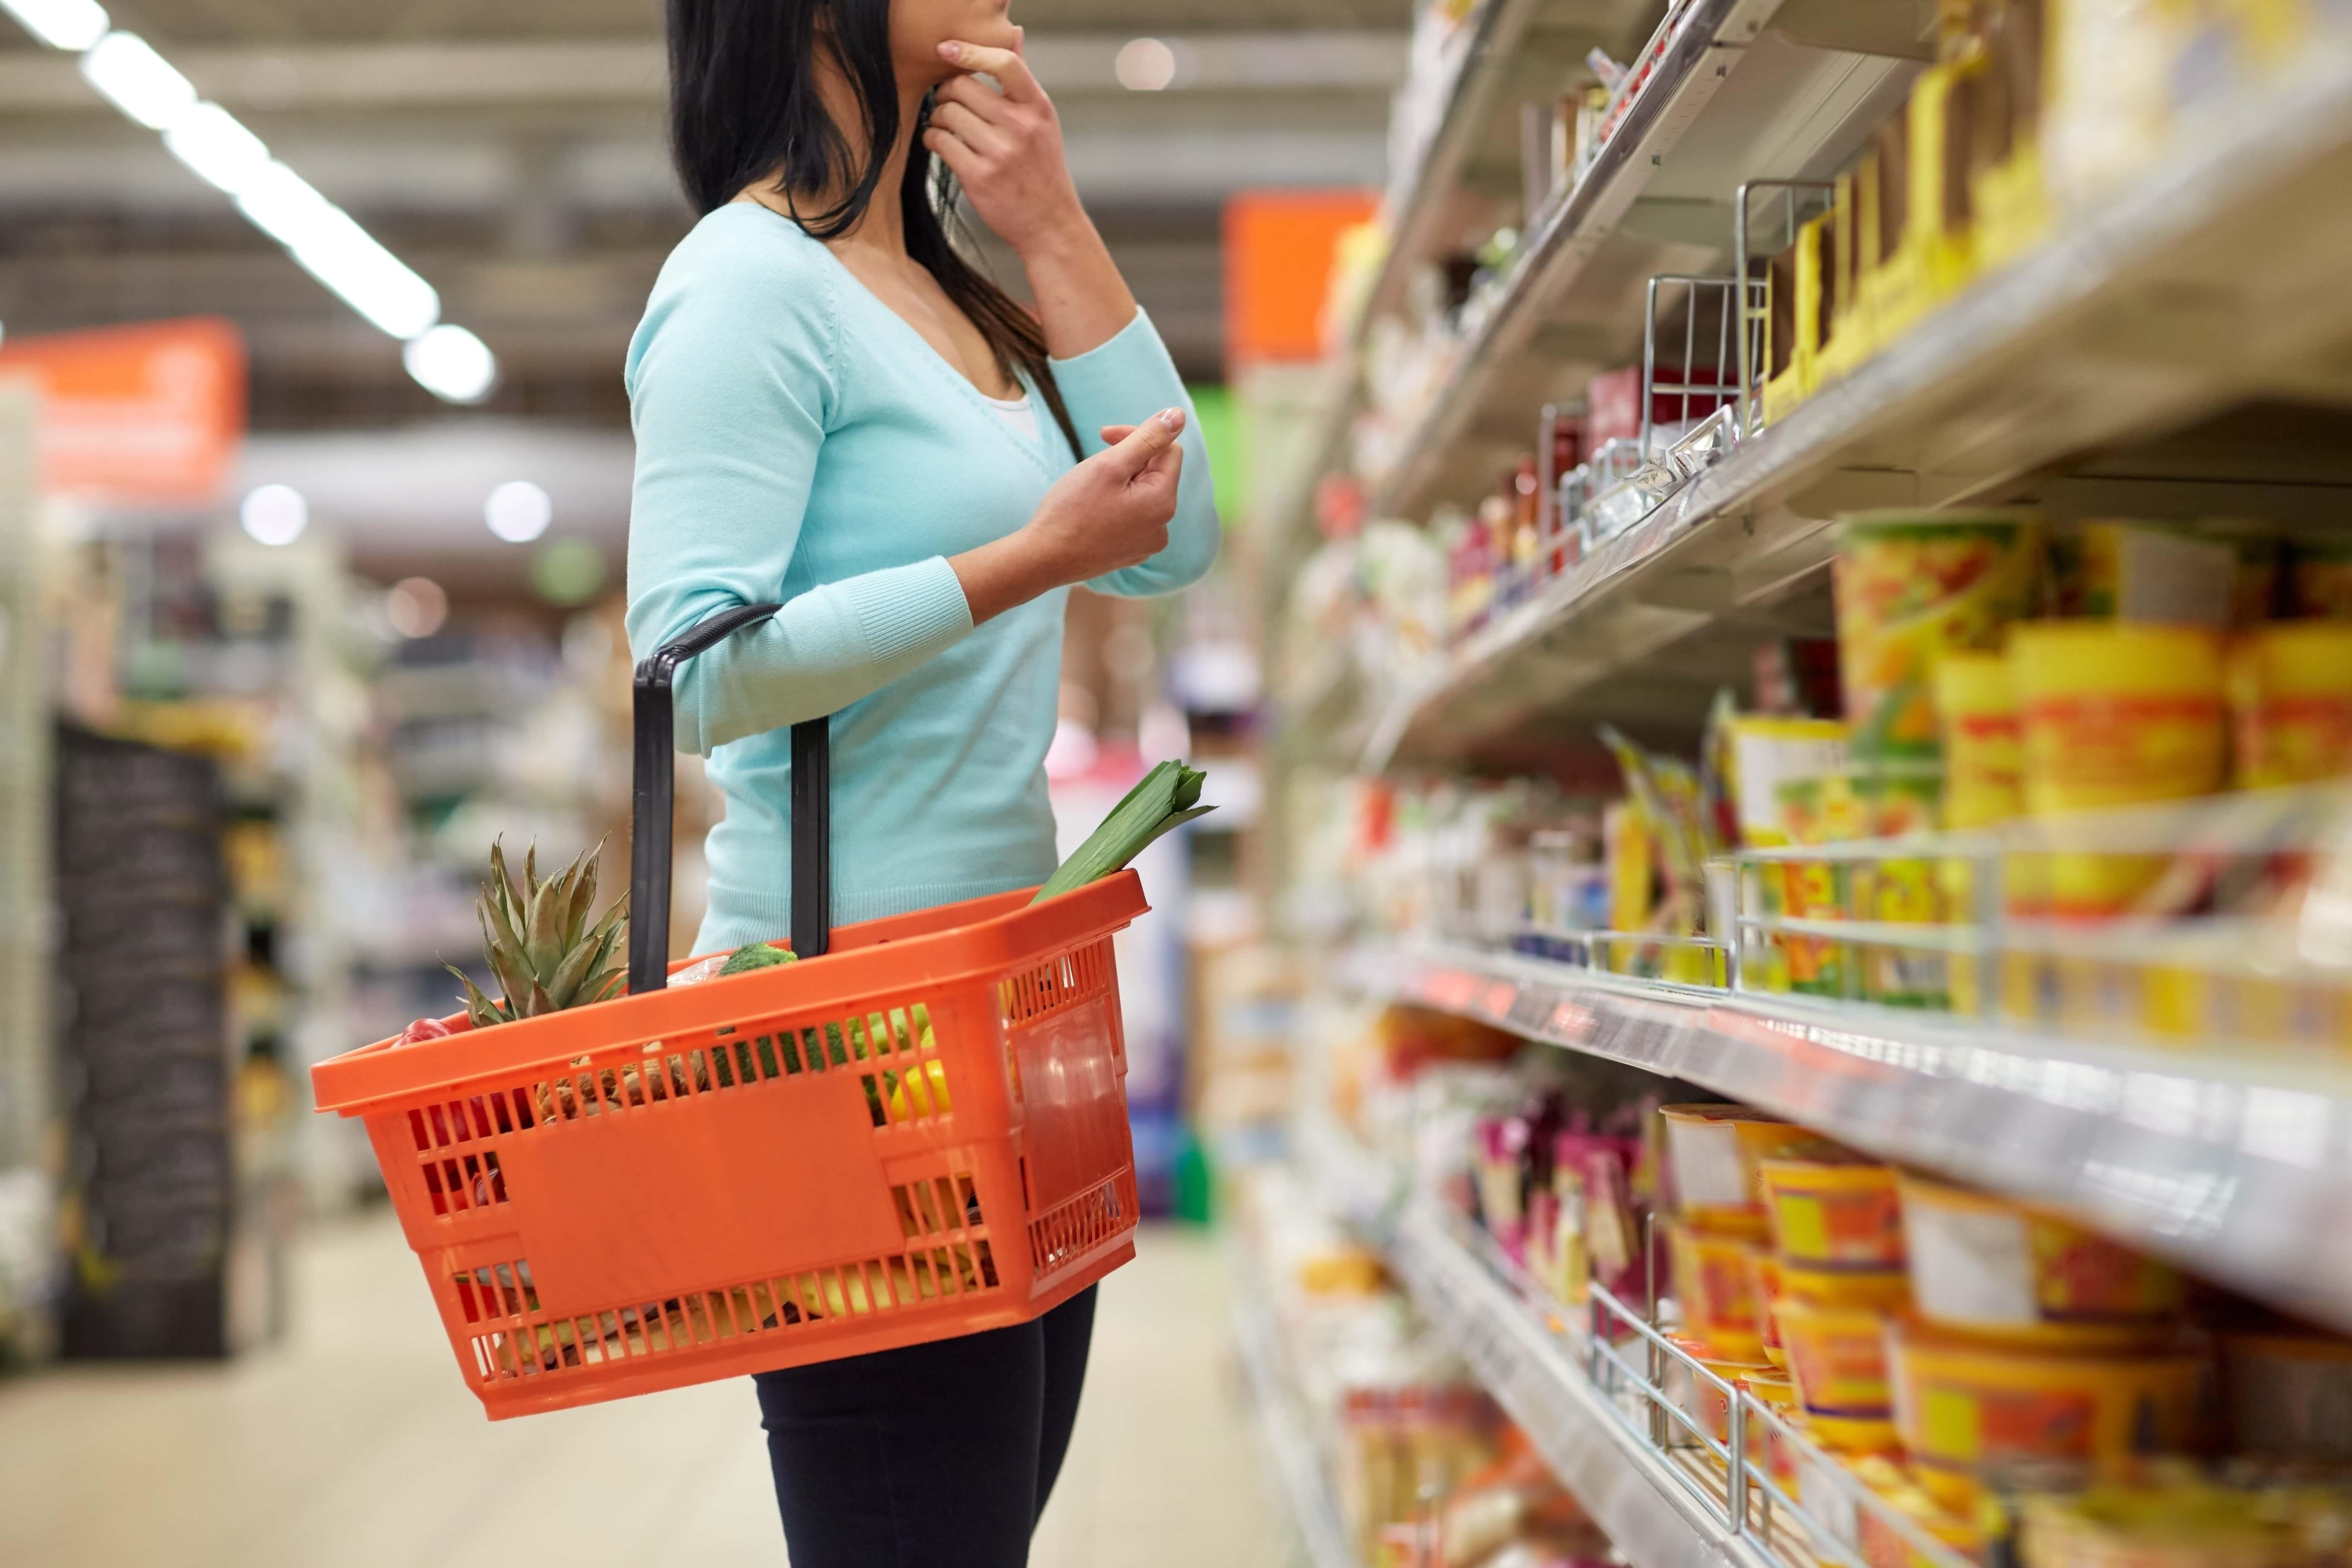 Fructosegehalt in Lebensmitteln, Fertignahrung, Fertigprodukten